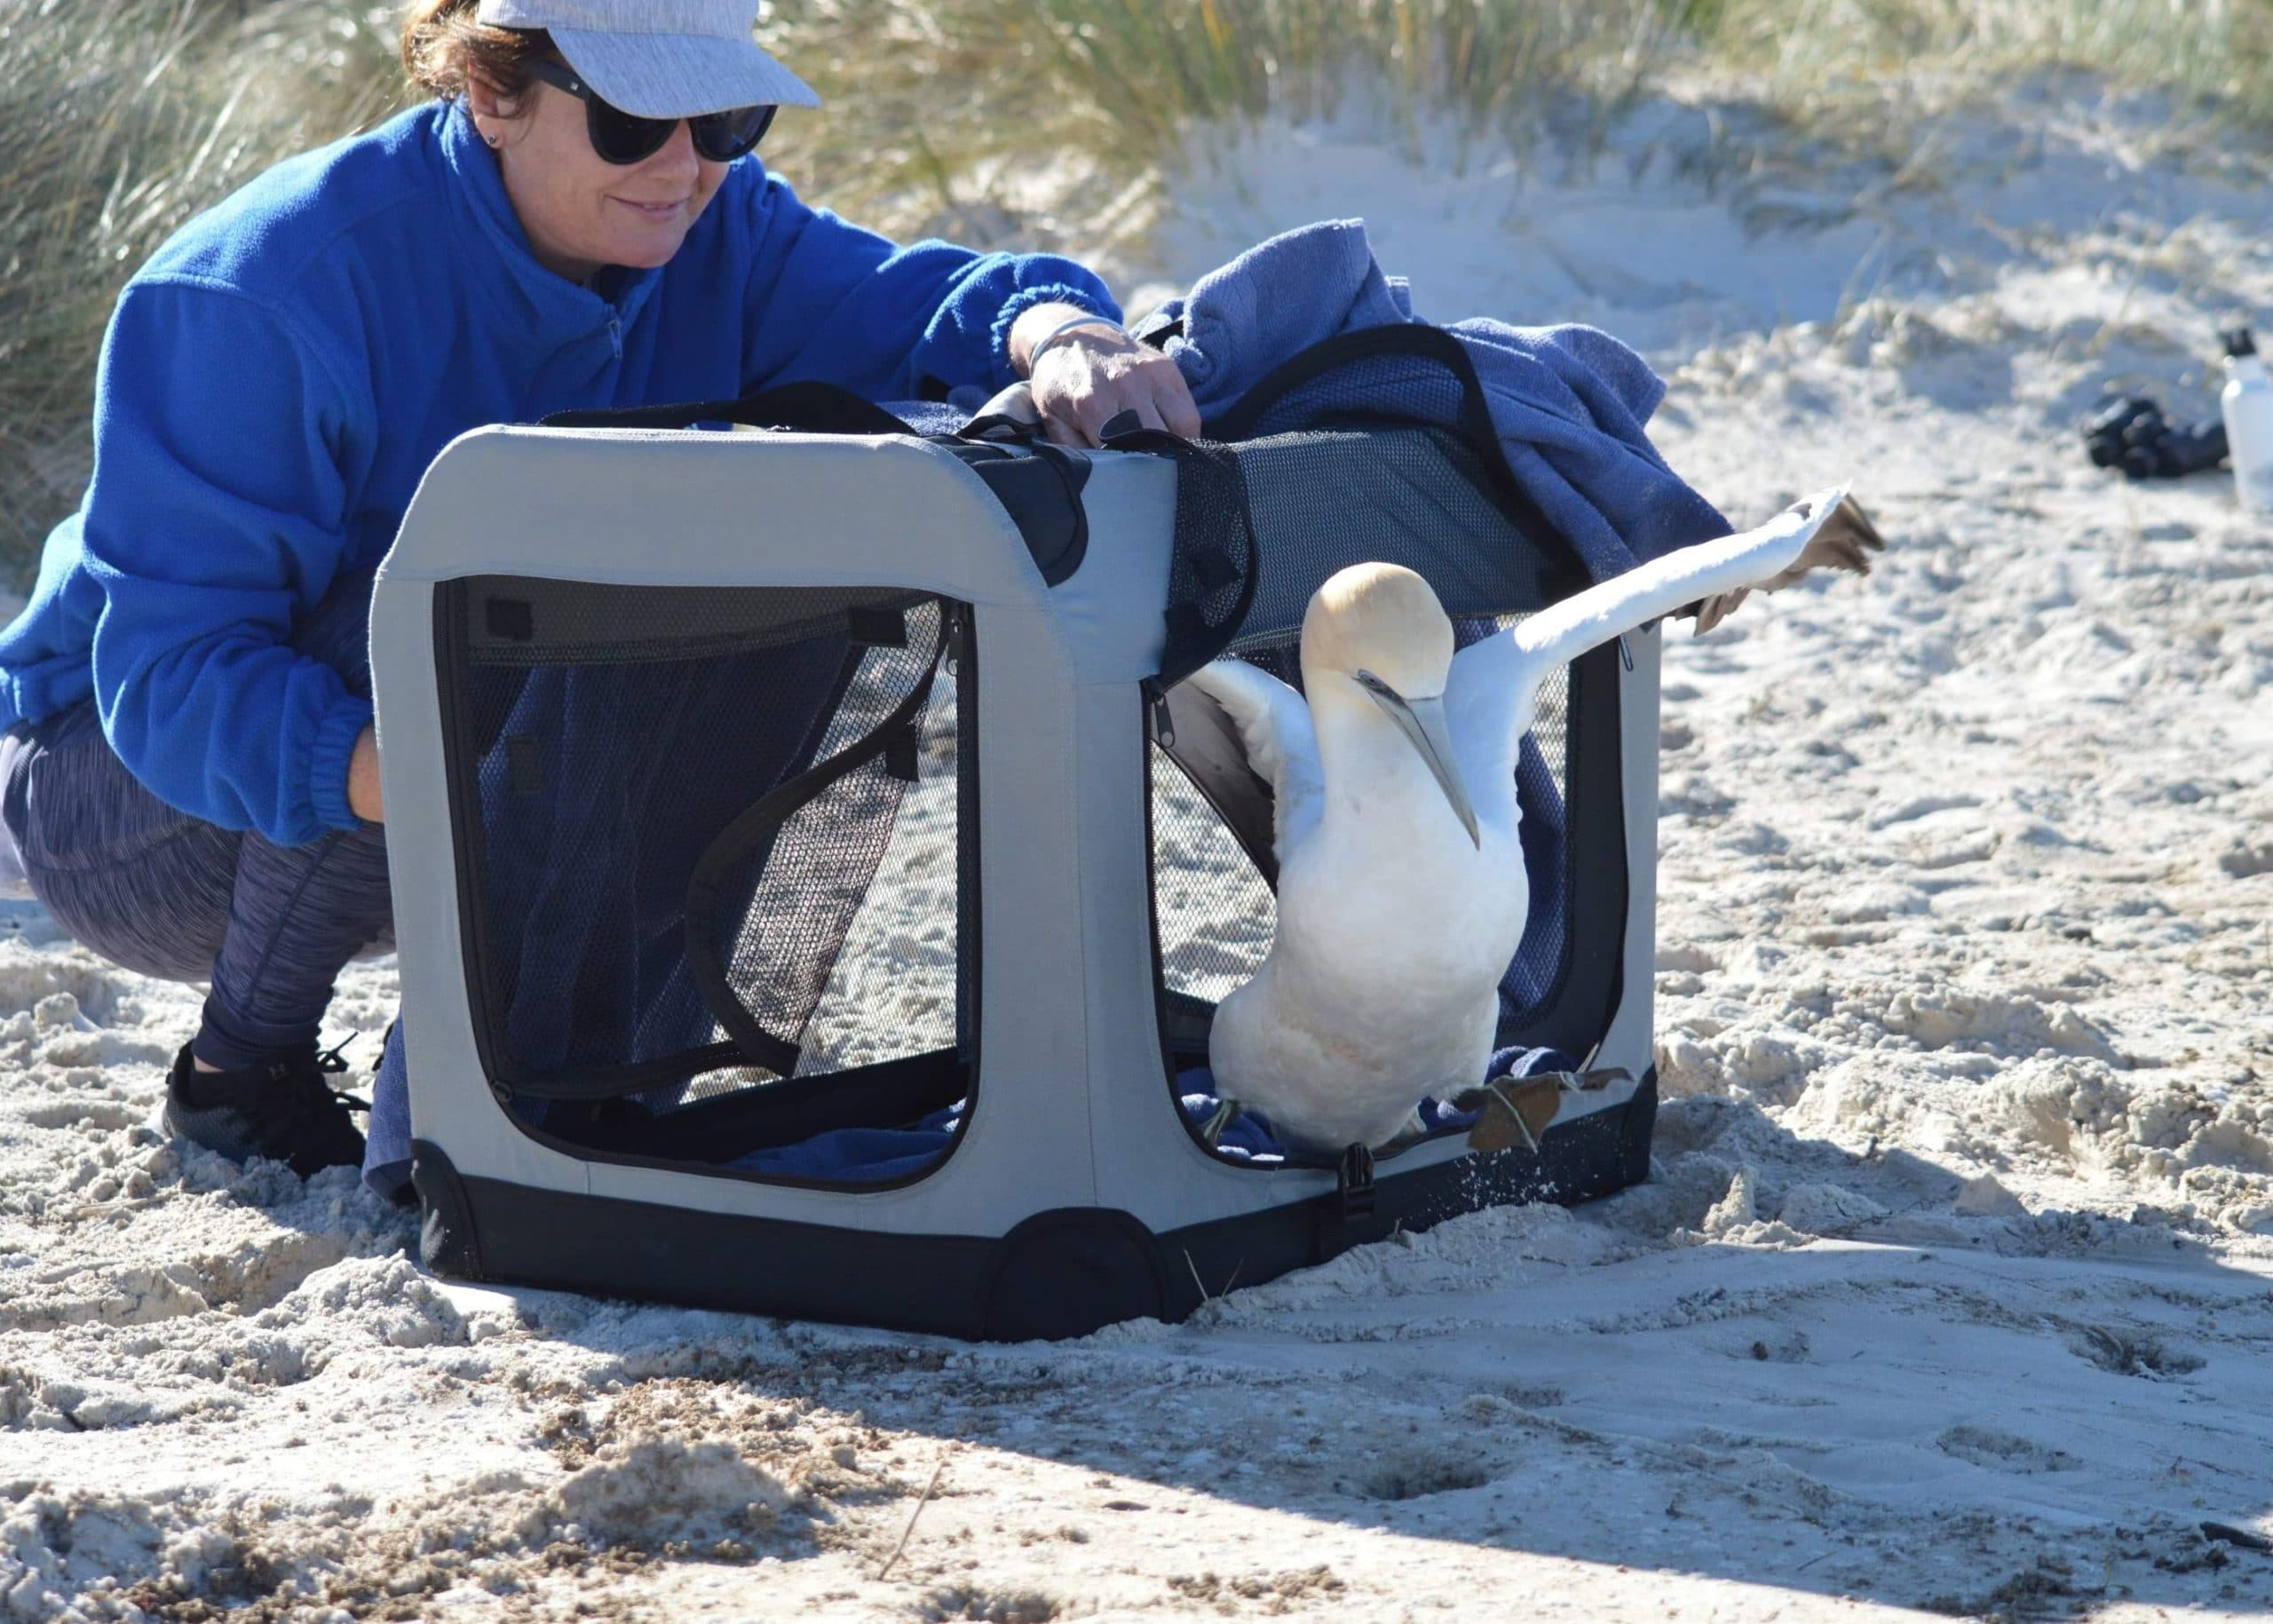 Sea Bird rescue release at the beach